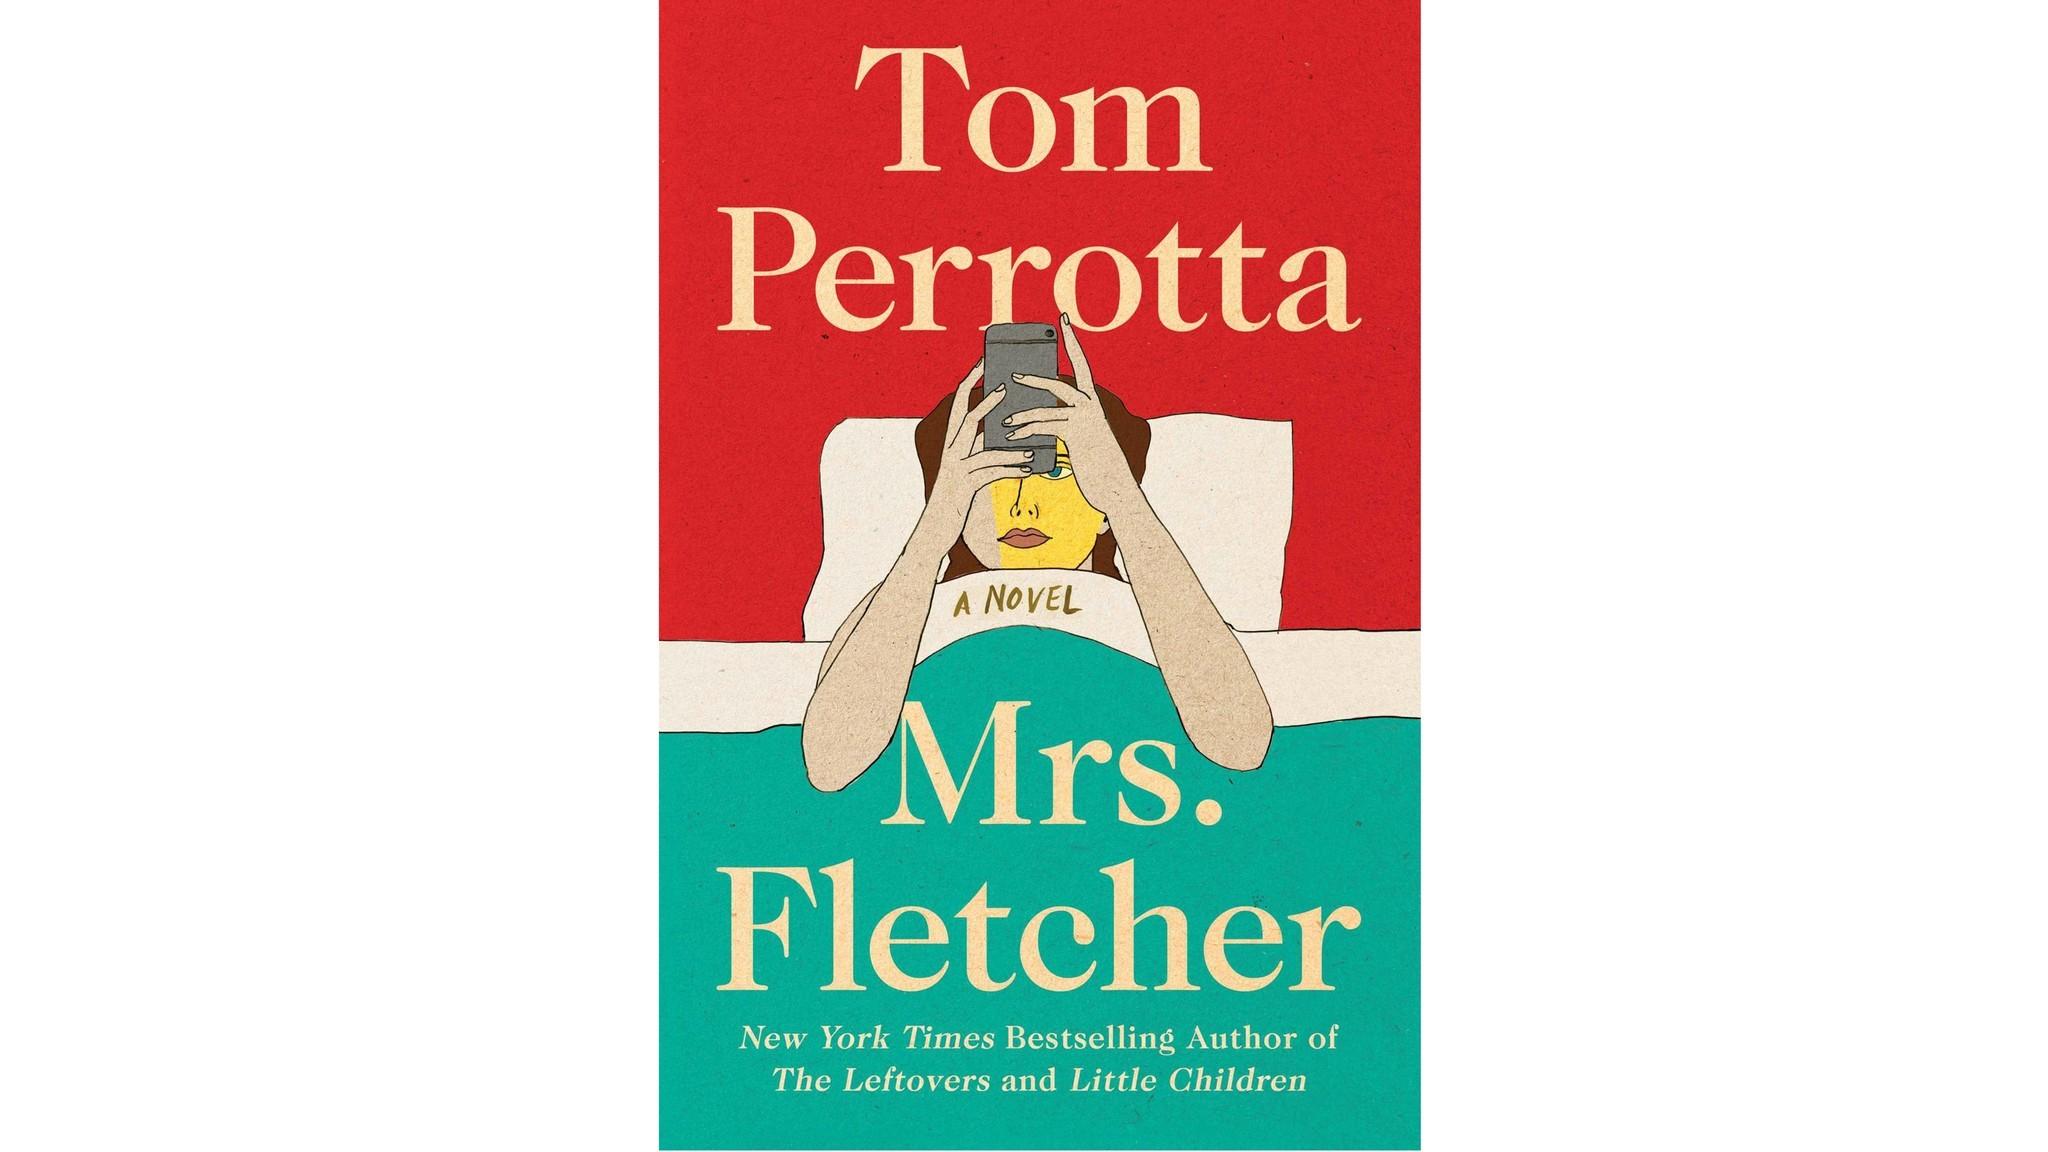 Tom Perrotta's 'Mrs. Fletcher'.